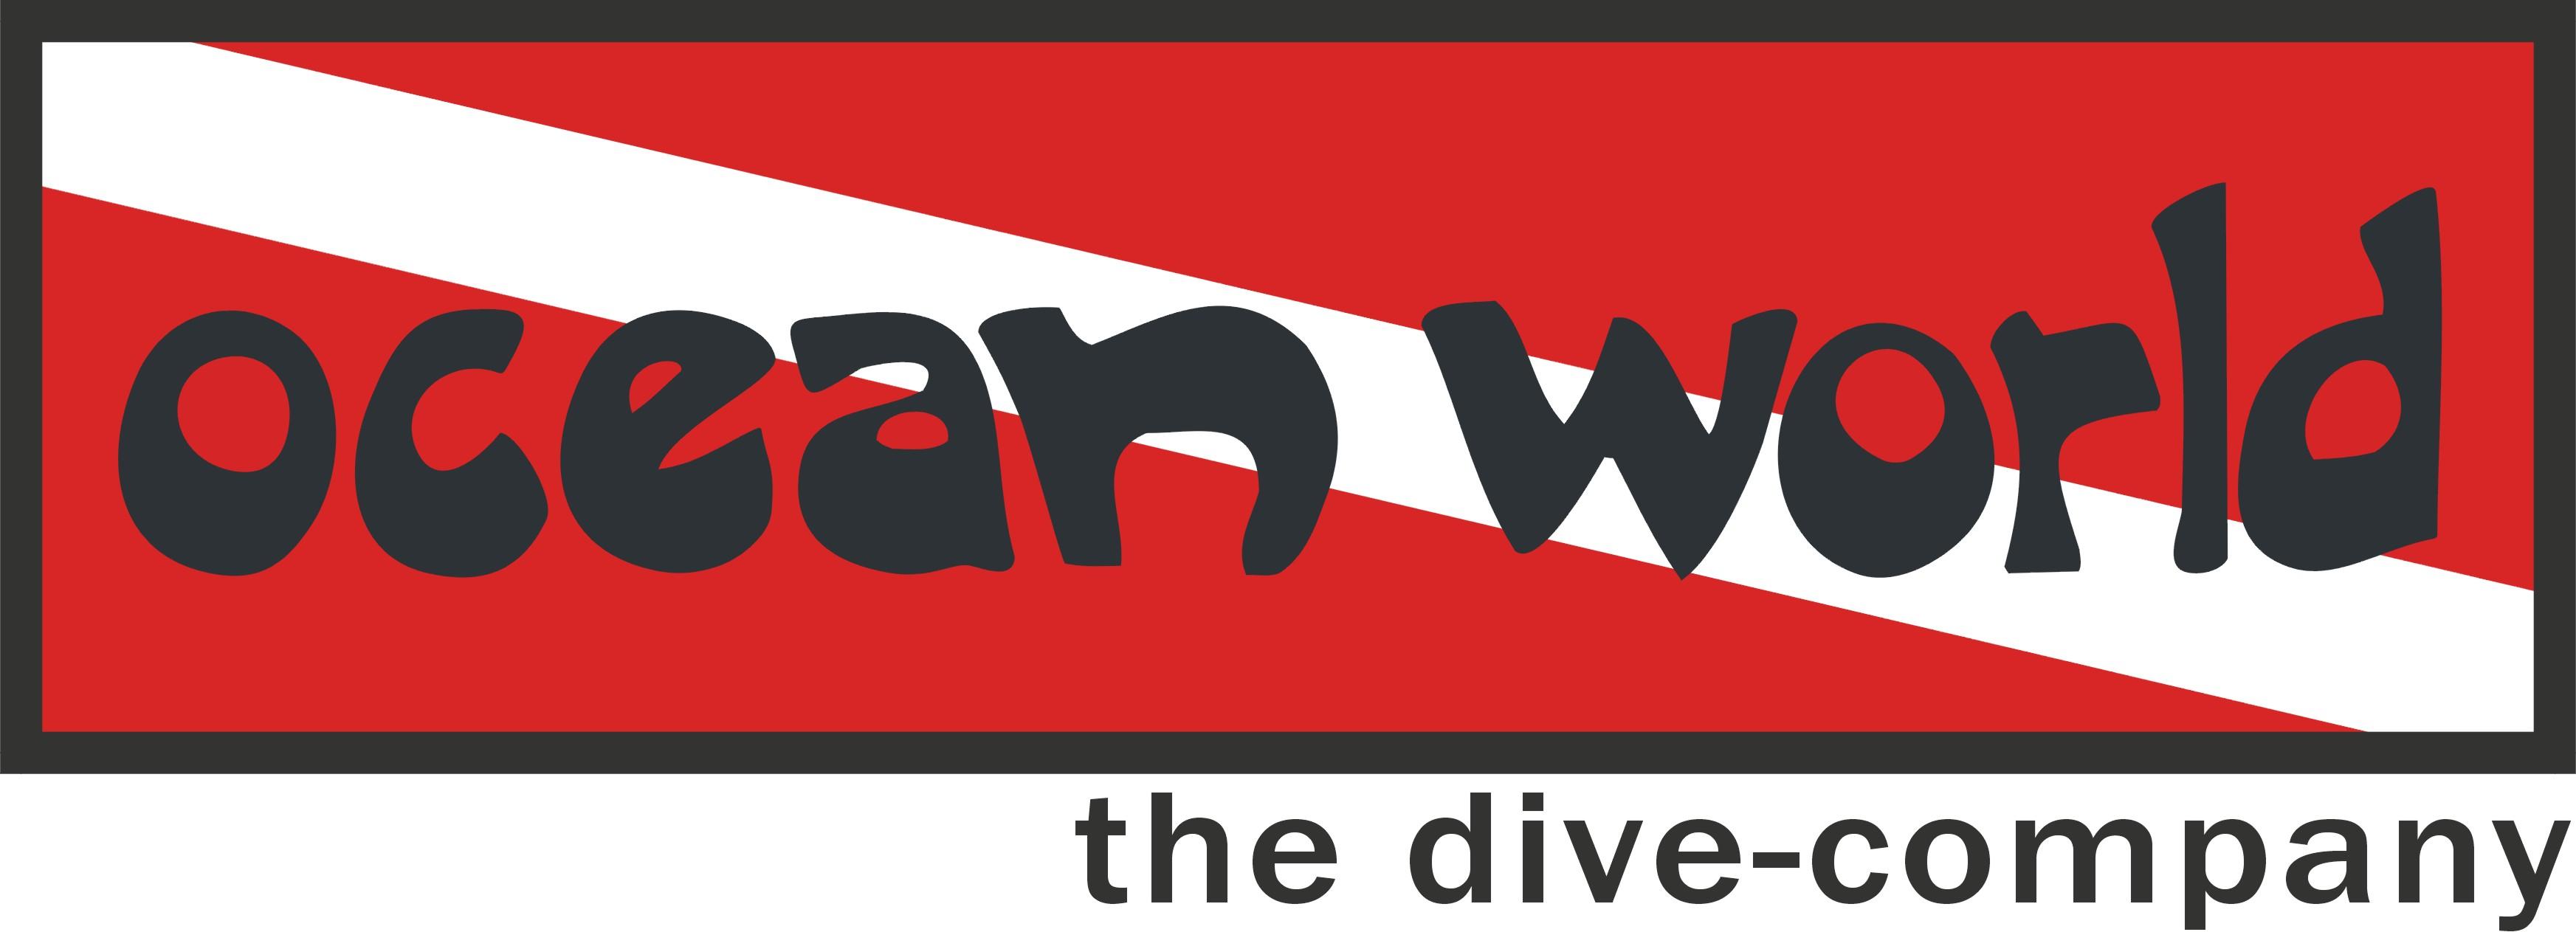 logo_ocean_world_dive_company